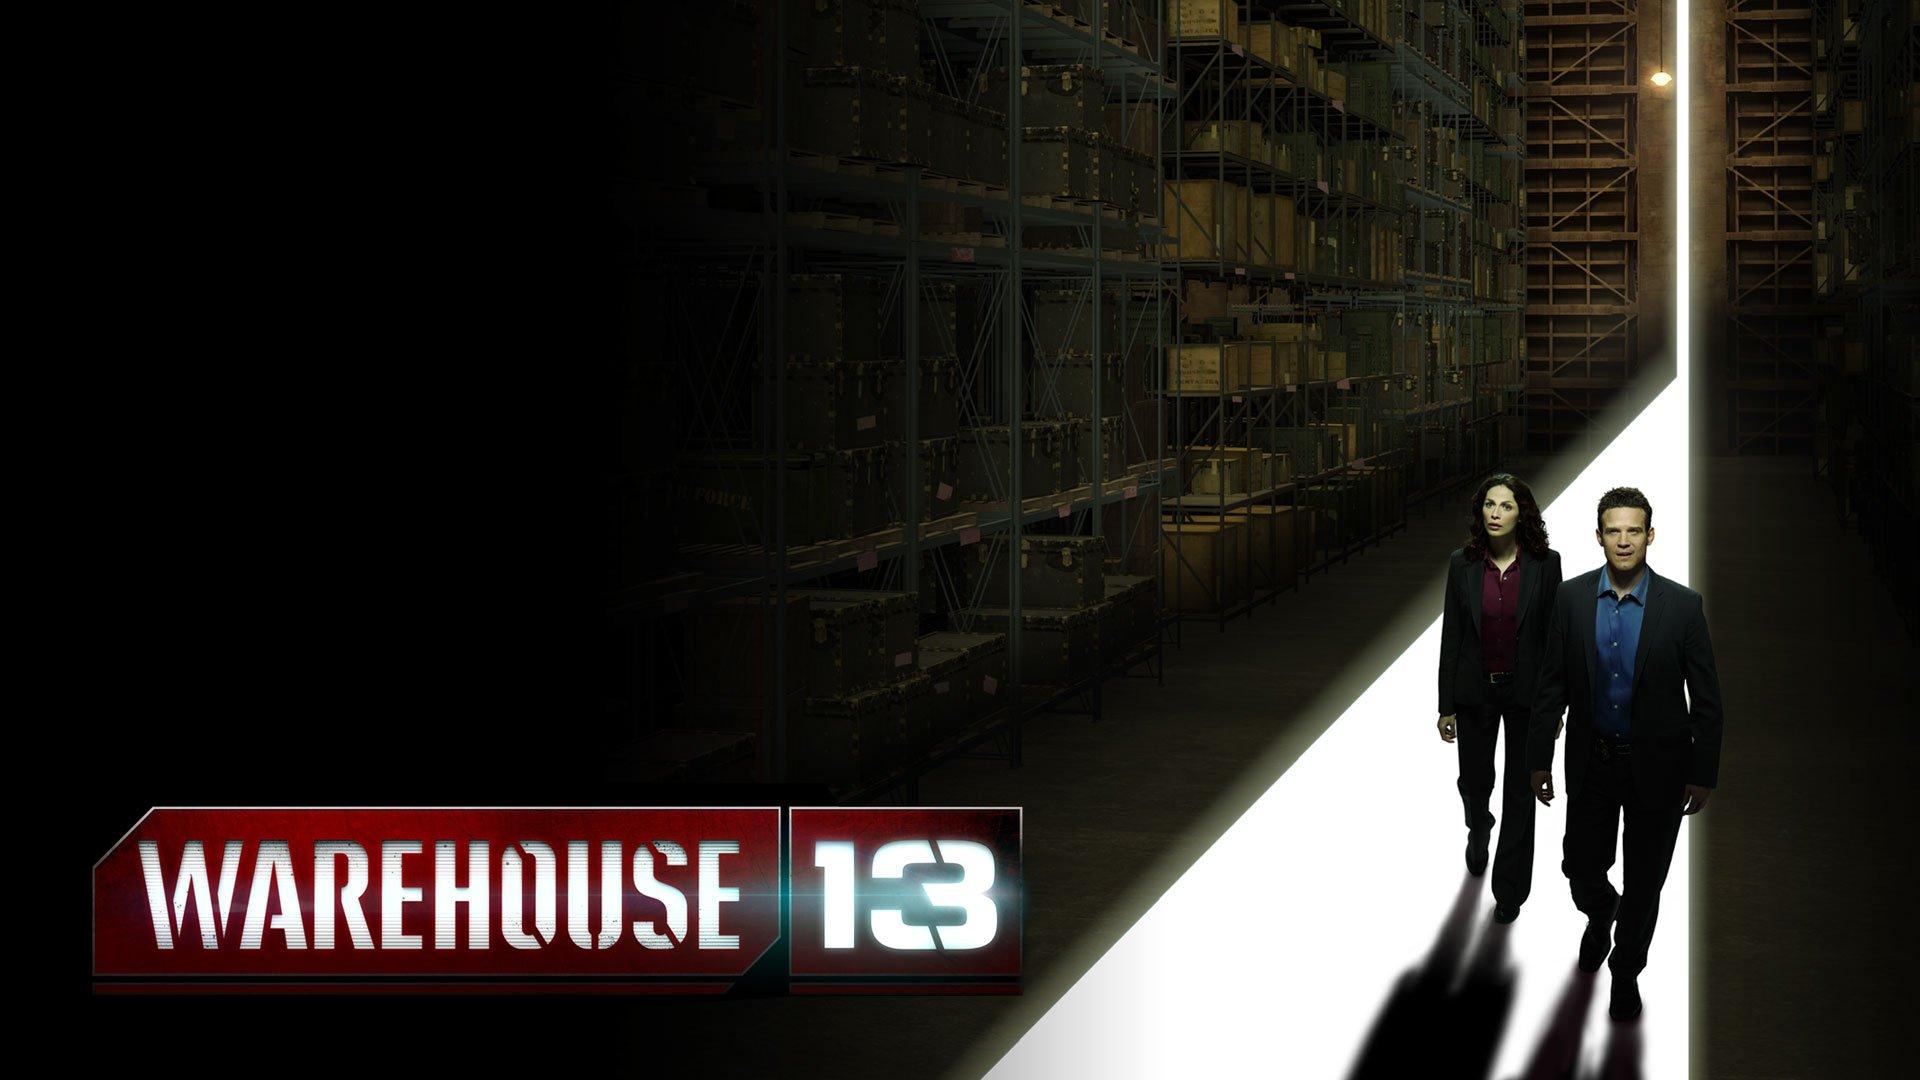 Warehouse 13 HD Wallpaper | Background Image | 1920x1080 ...